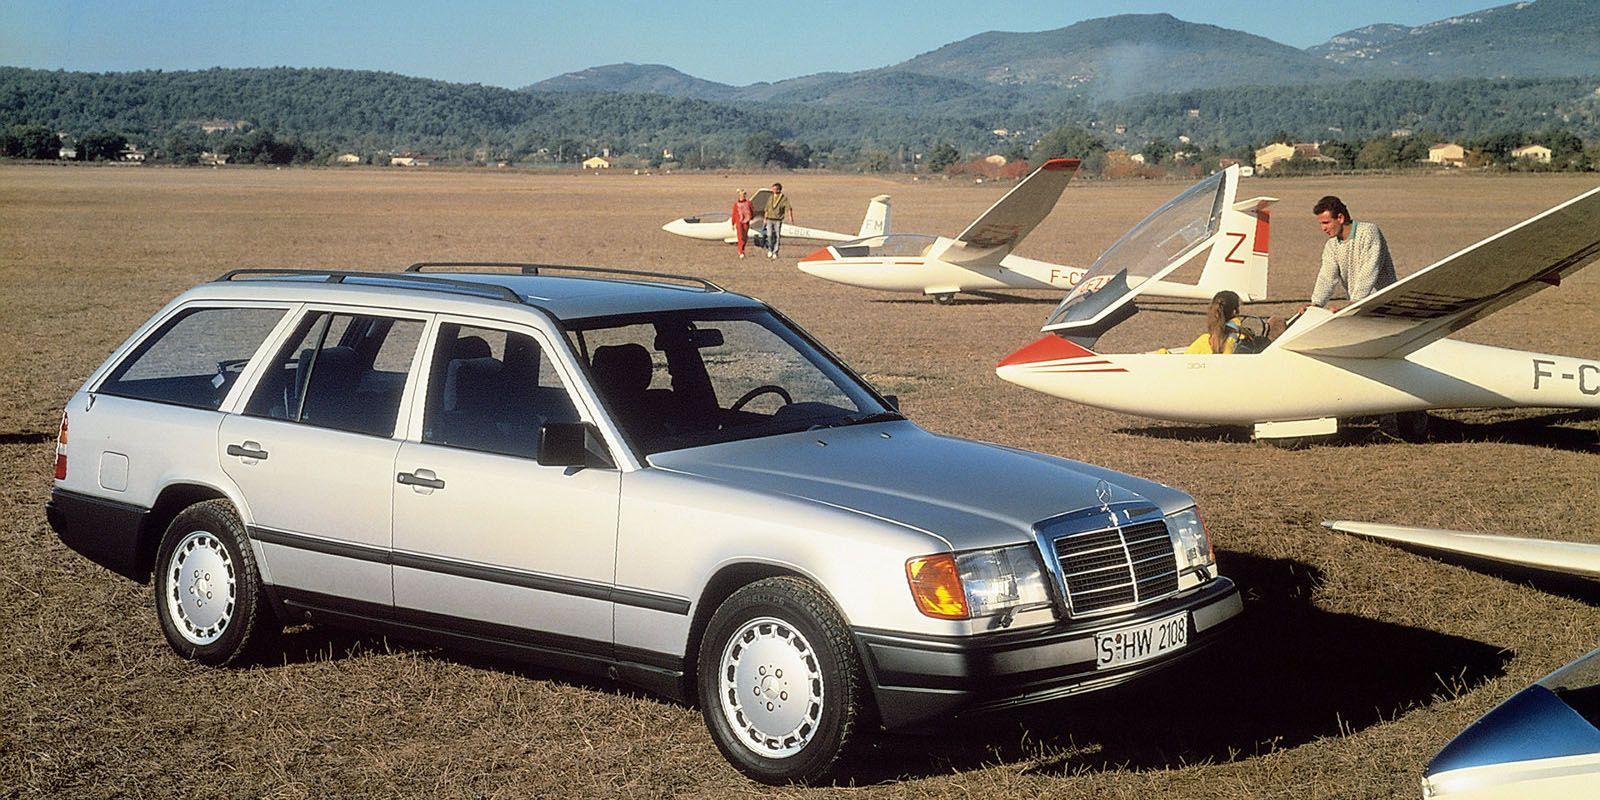 All Types mercedes e class estate 2010 : Throwback Press Photo of the Week: 1988 Mercedes-Benz E-Class Estate